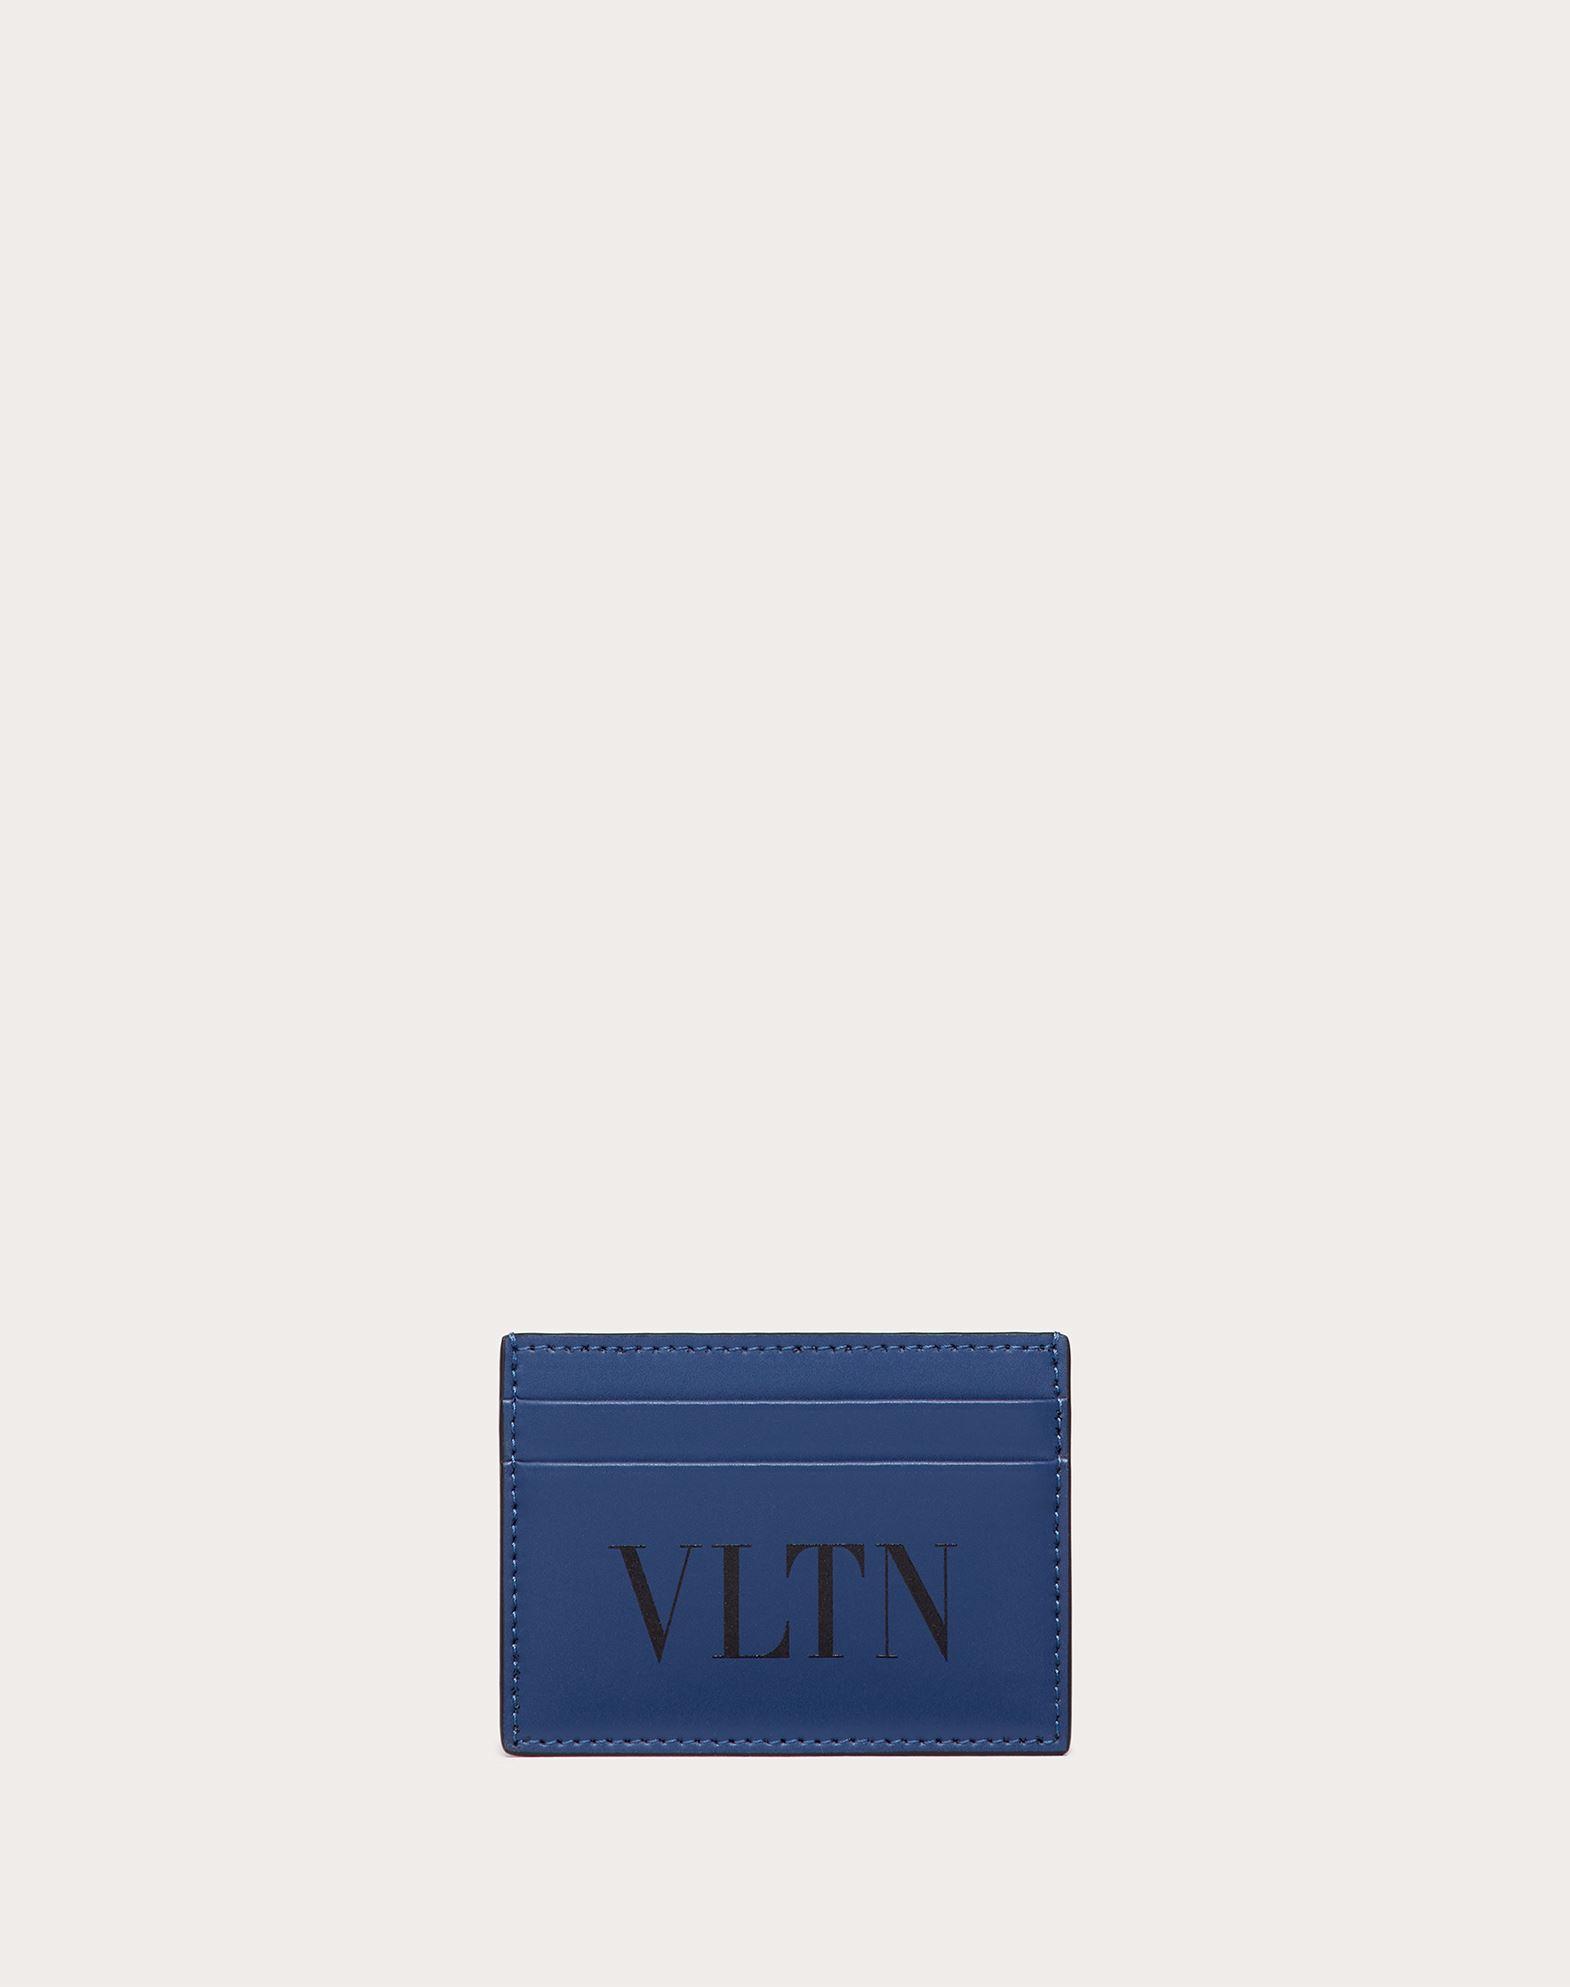 Valentino Garavani Uomo Kartenetui Vltn Herren Indigo 100% Pelle Bovina - Bos Taurus Onesize In Blue